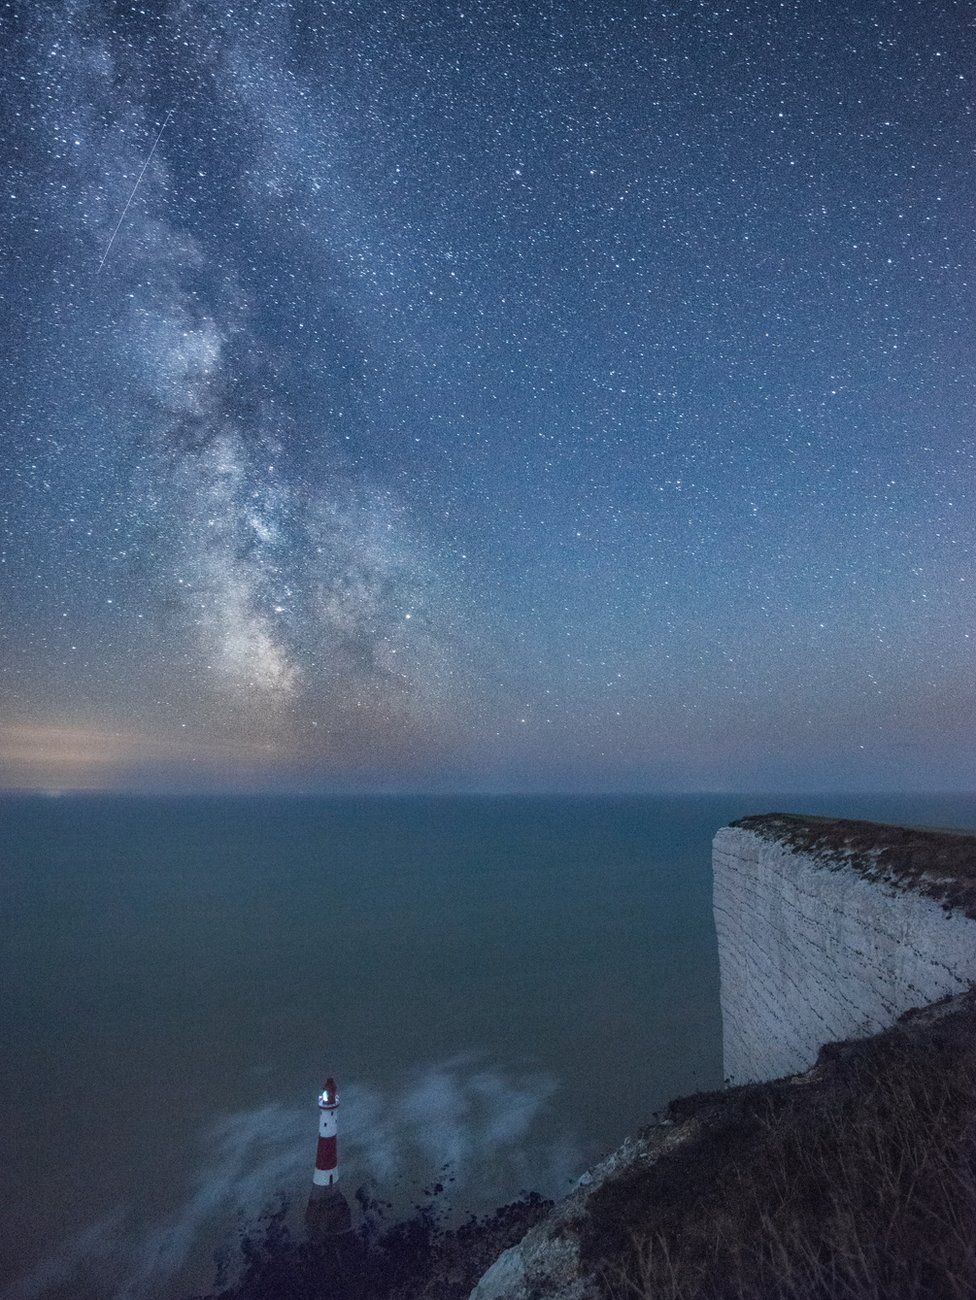 a Perseid meteor shower over sea